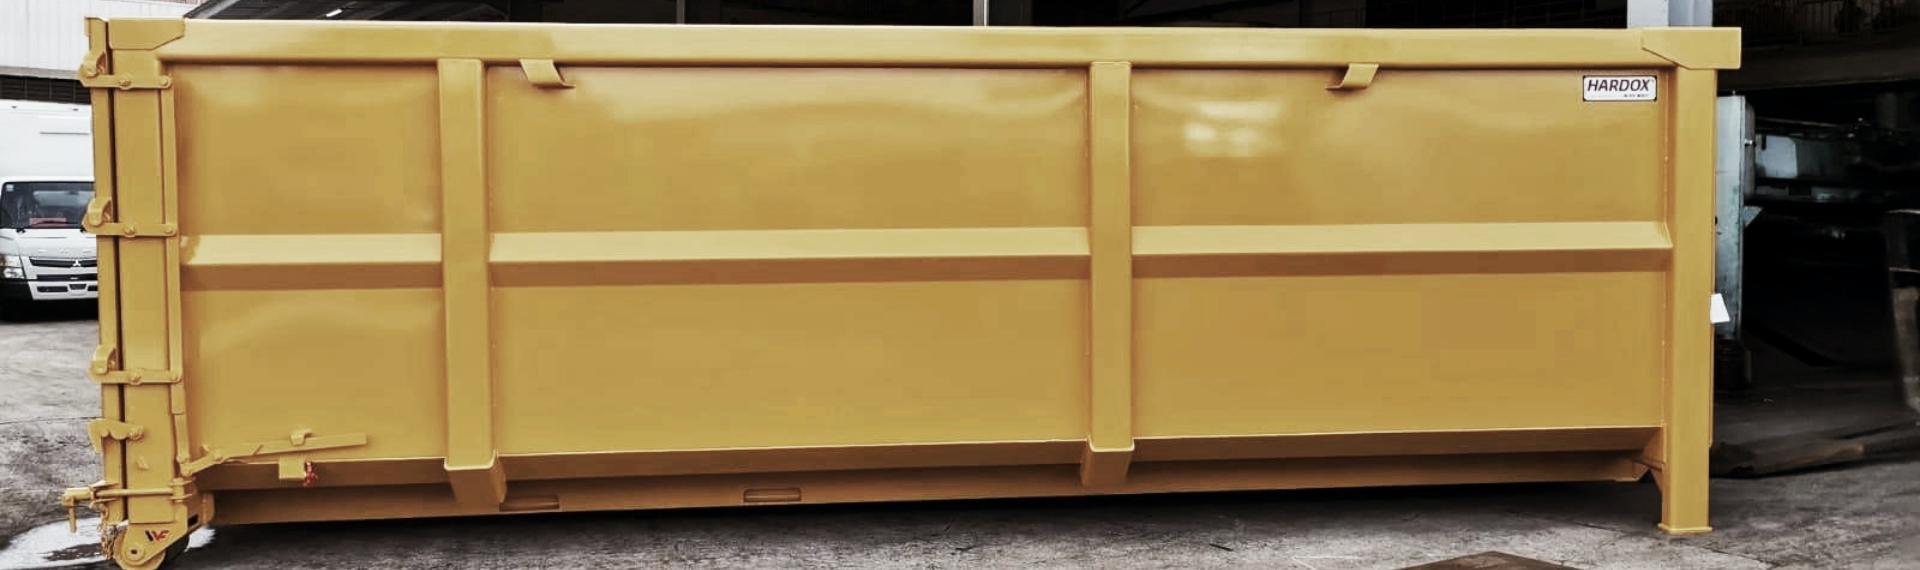 A sleek yellow steel waste container built in Hardox® HiAce steel.